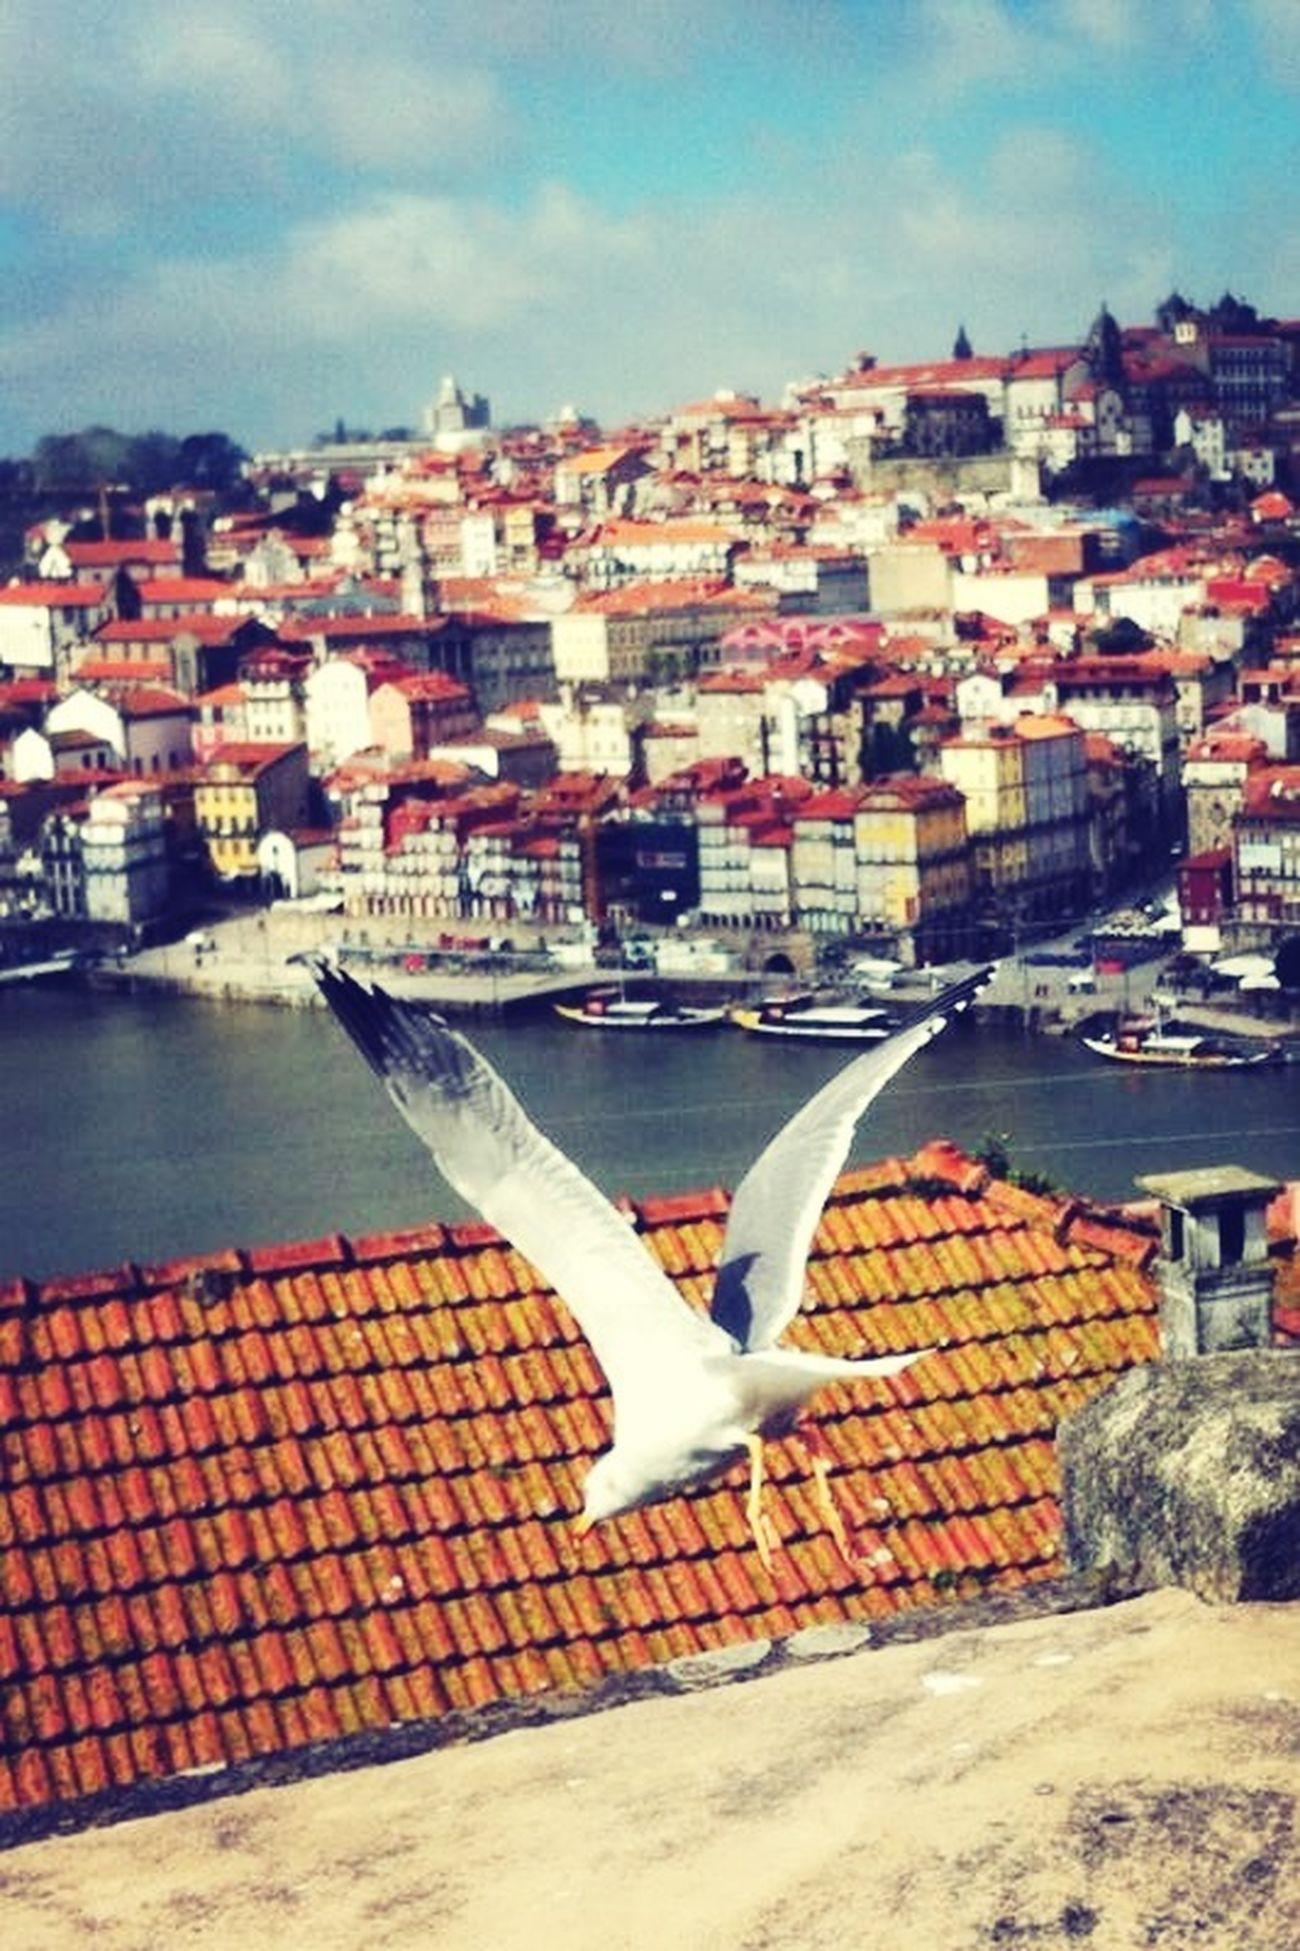 Unique Moments Portugal